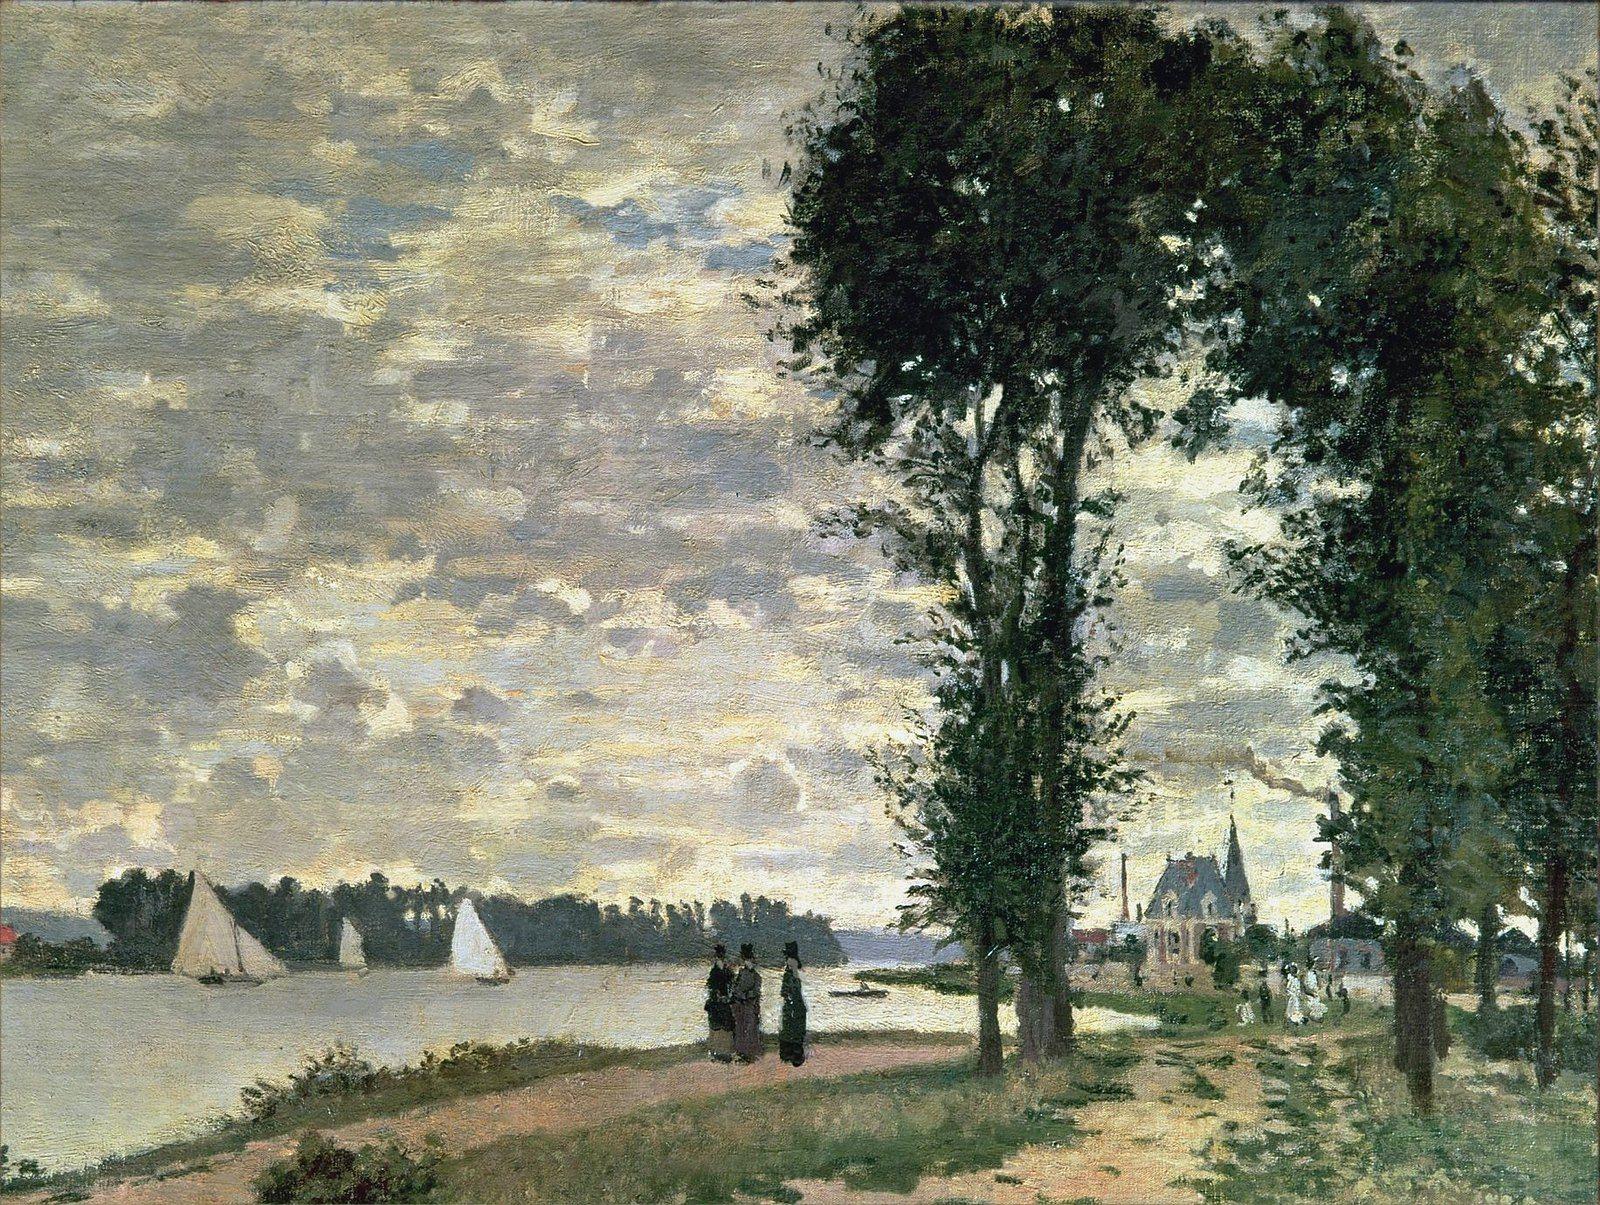 Claud Monet. The Seine at Argenteuil, 1872   Monet, Painting, Art